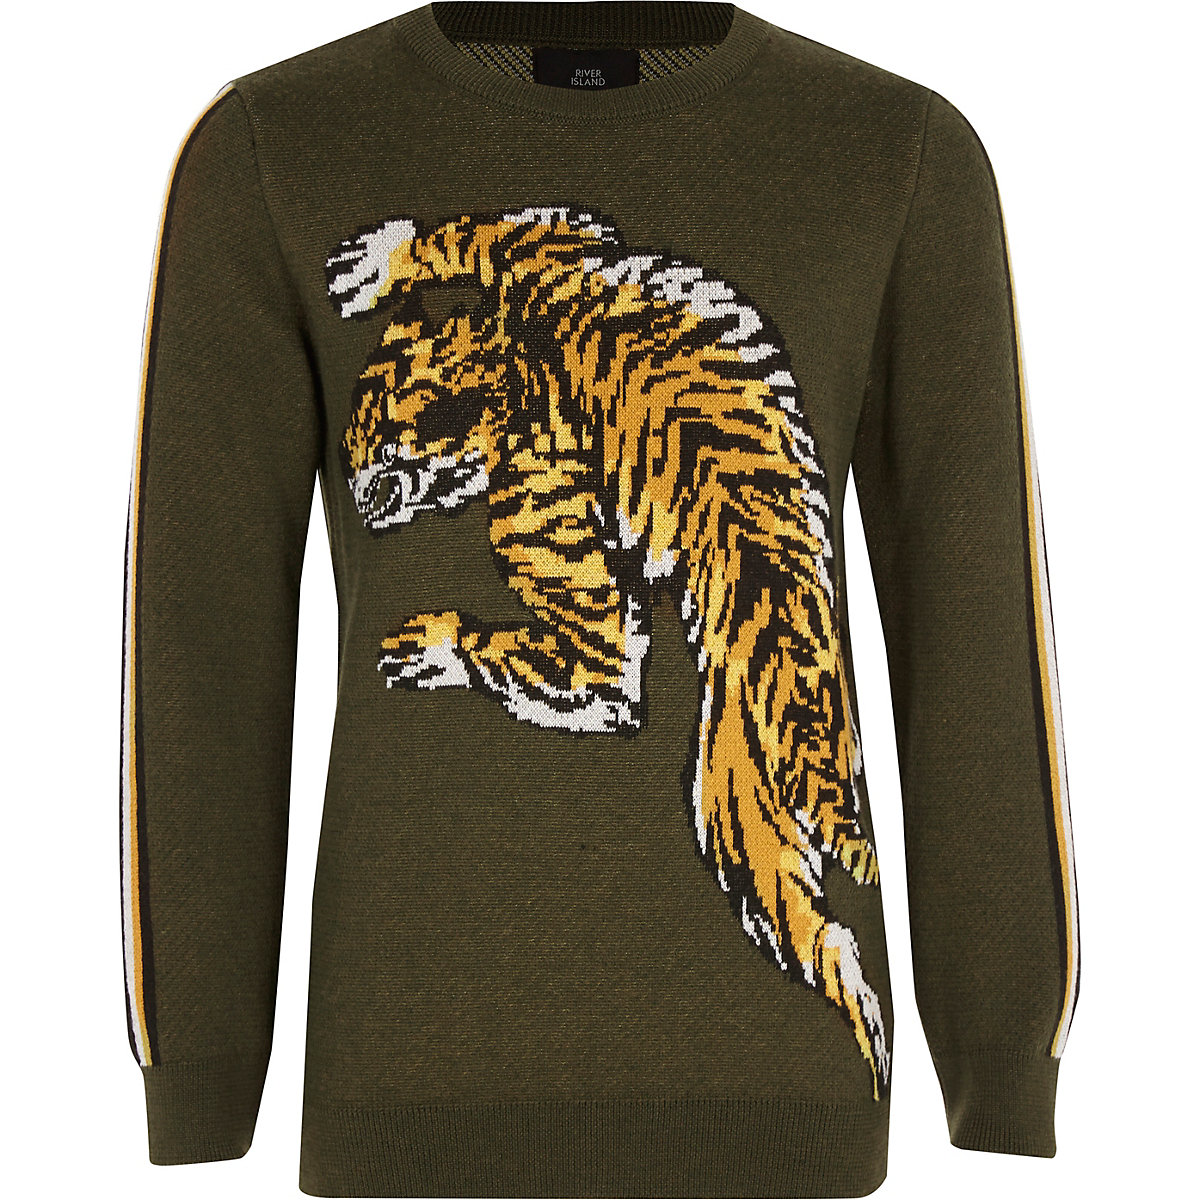 Boys khaki green tiger print jumper